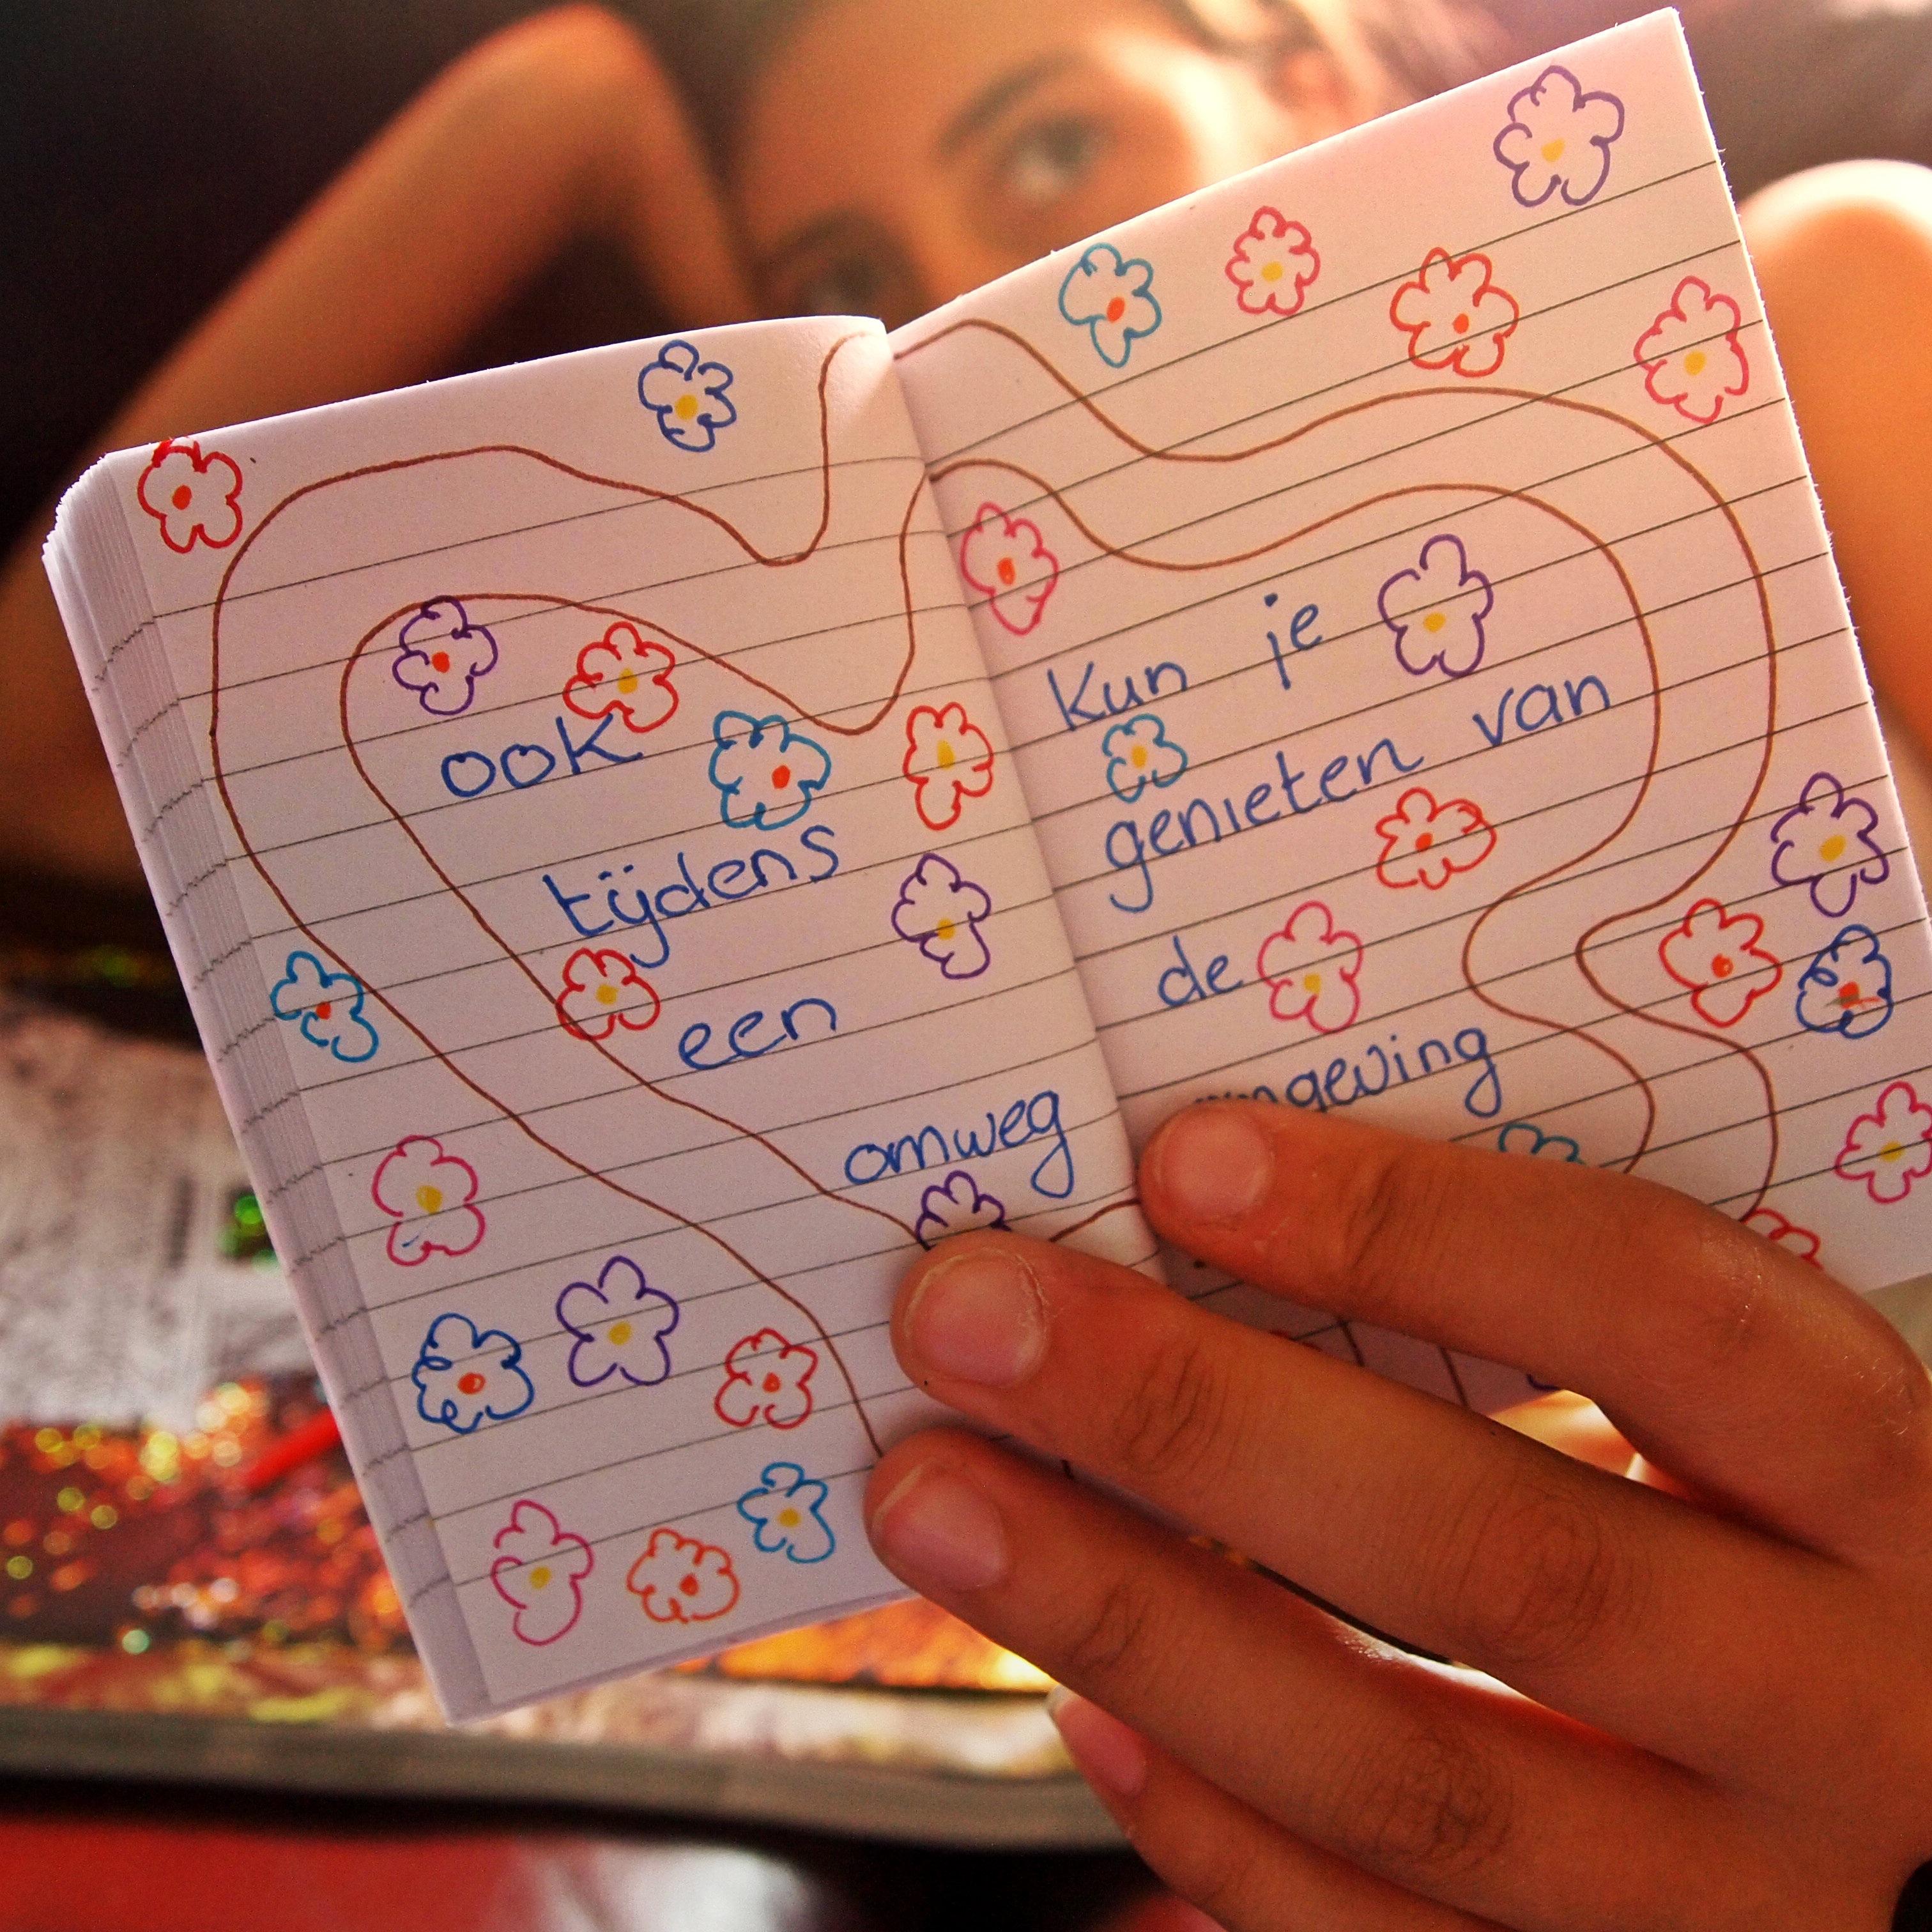 Gambar Penulisan Gadis Musim Panas Buku Harian Cinta Jari